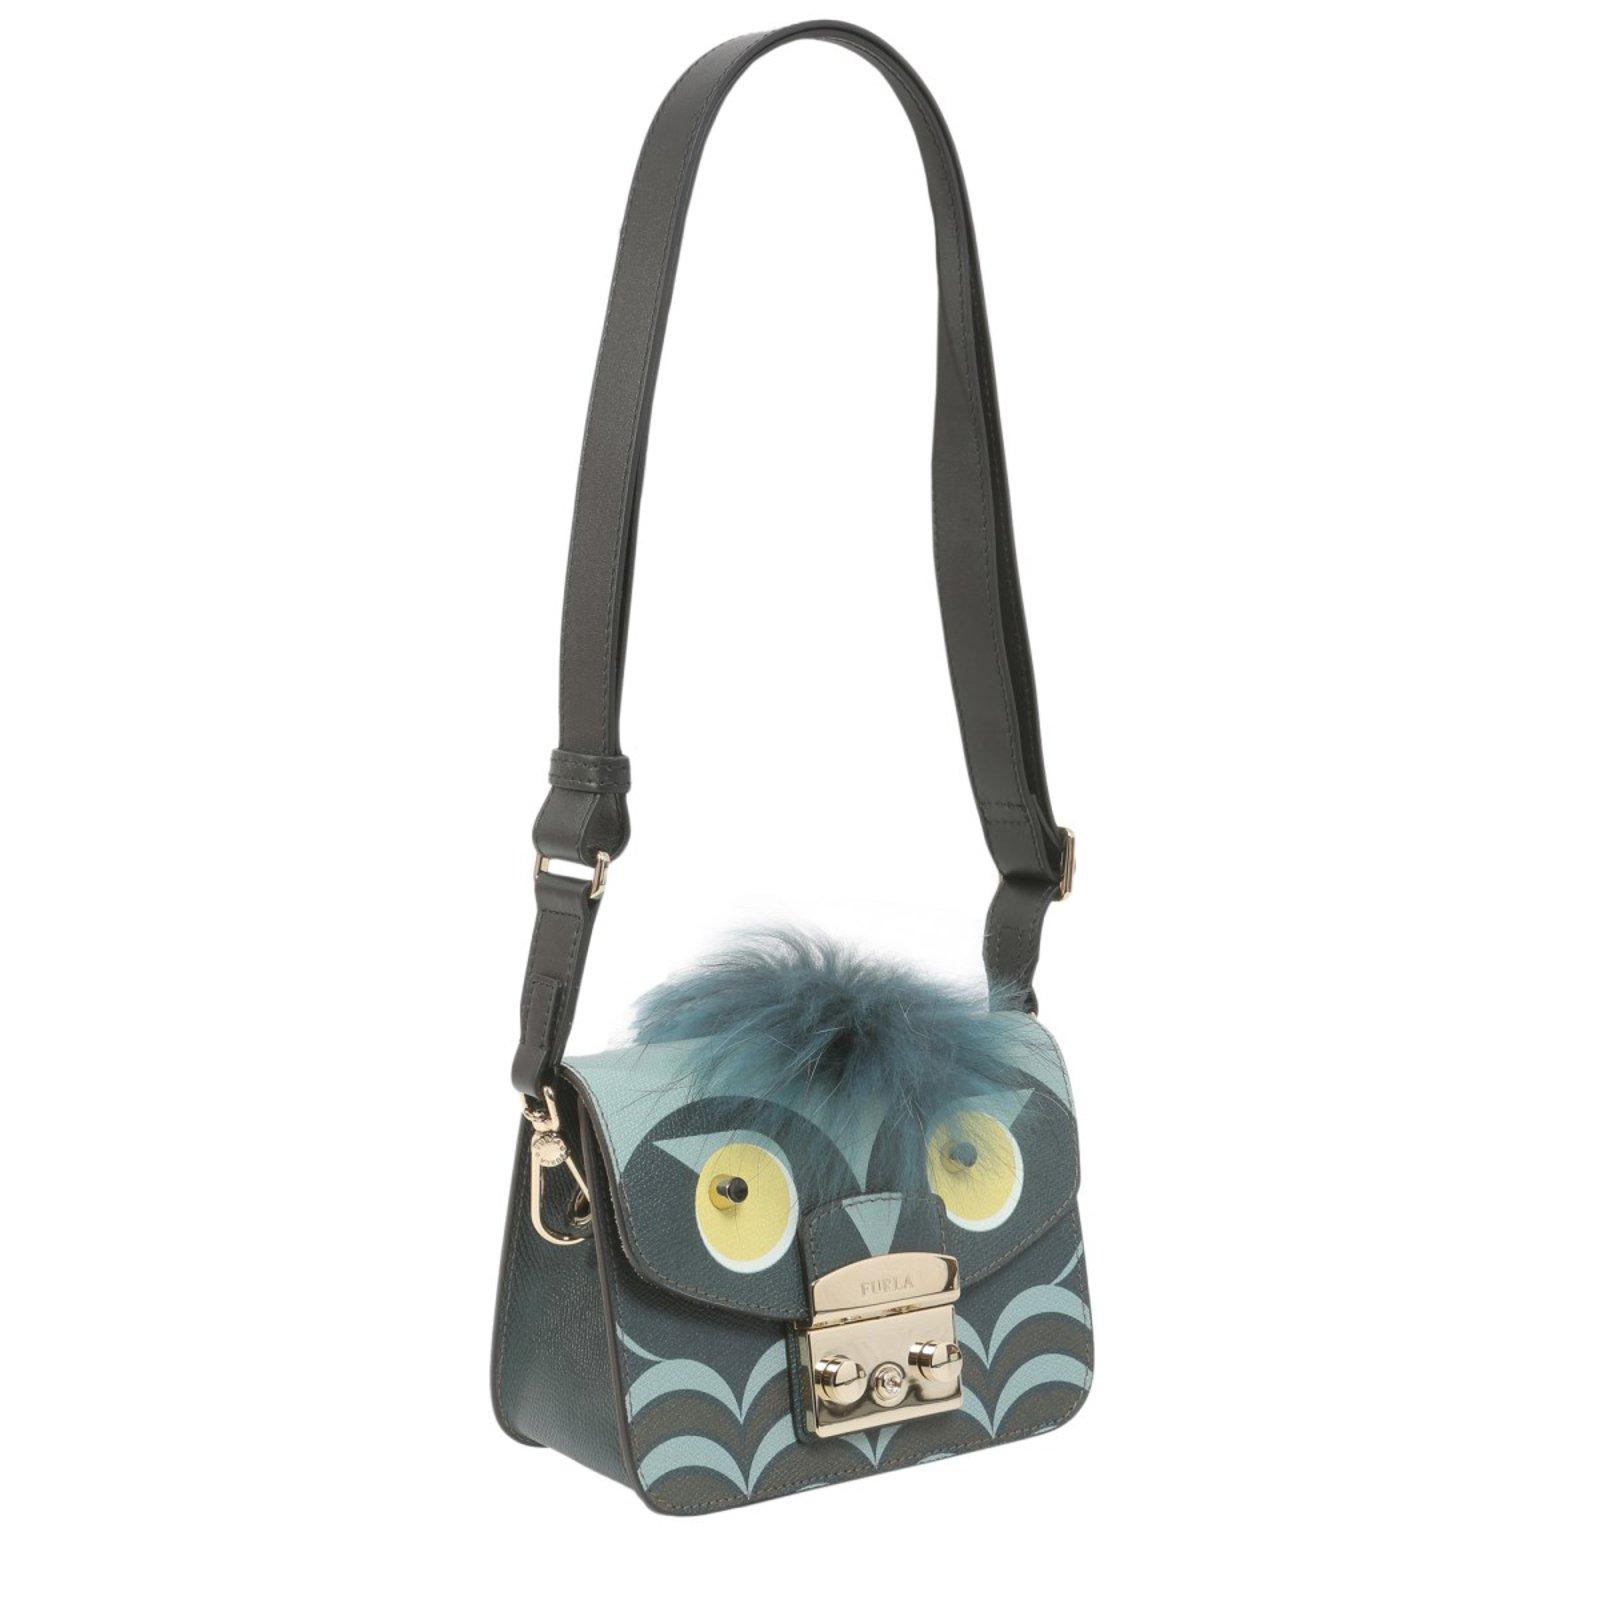 b238259f5d53 Furla Furla bag new Handbags Leather Dark grey ref.77347 - Joli Closet